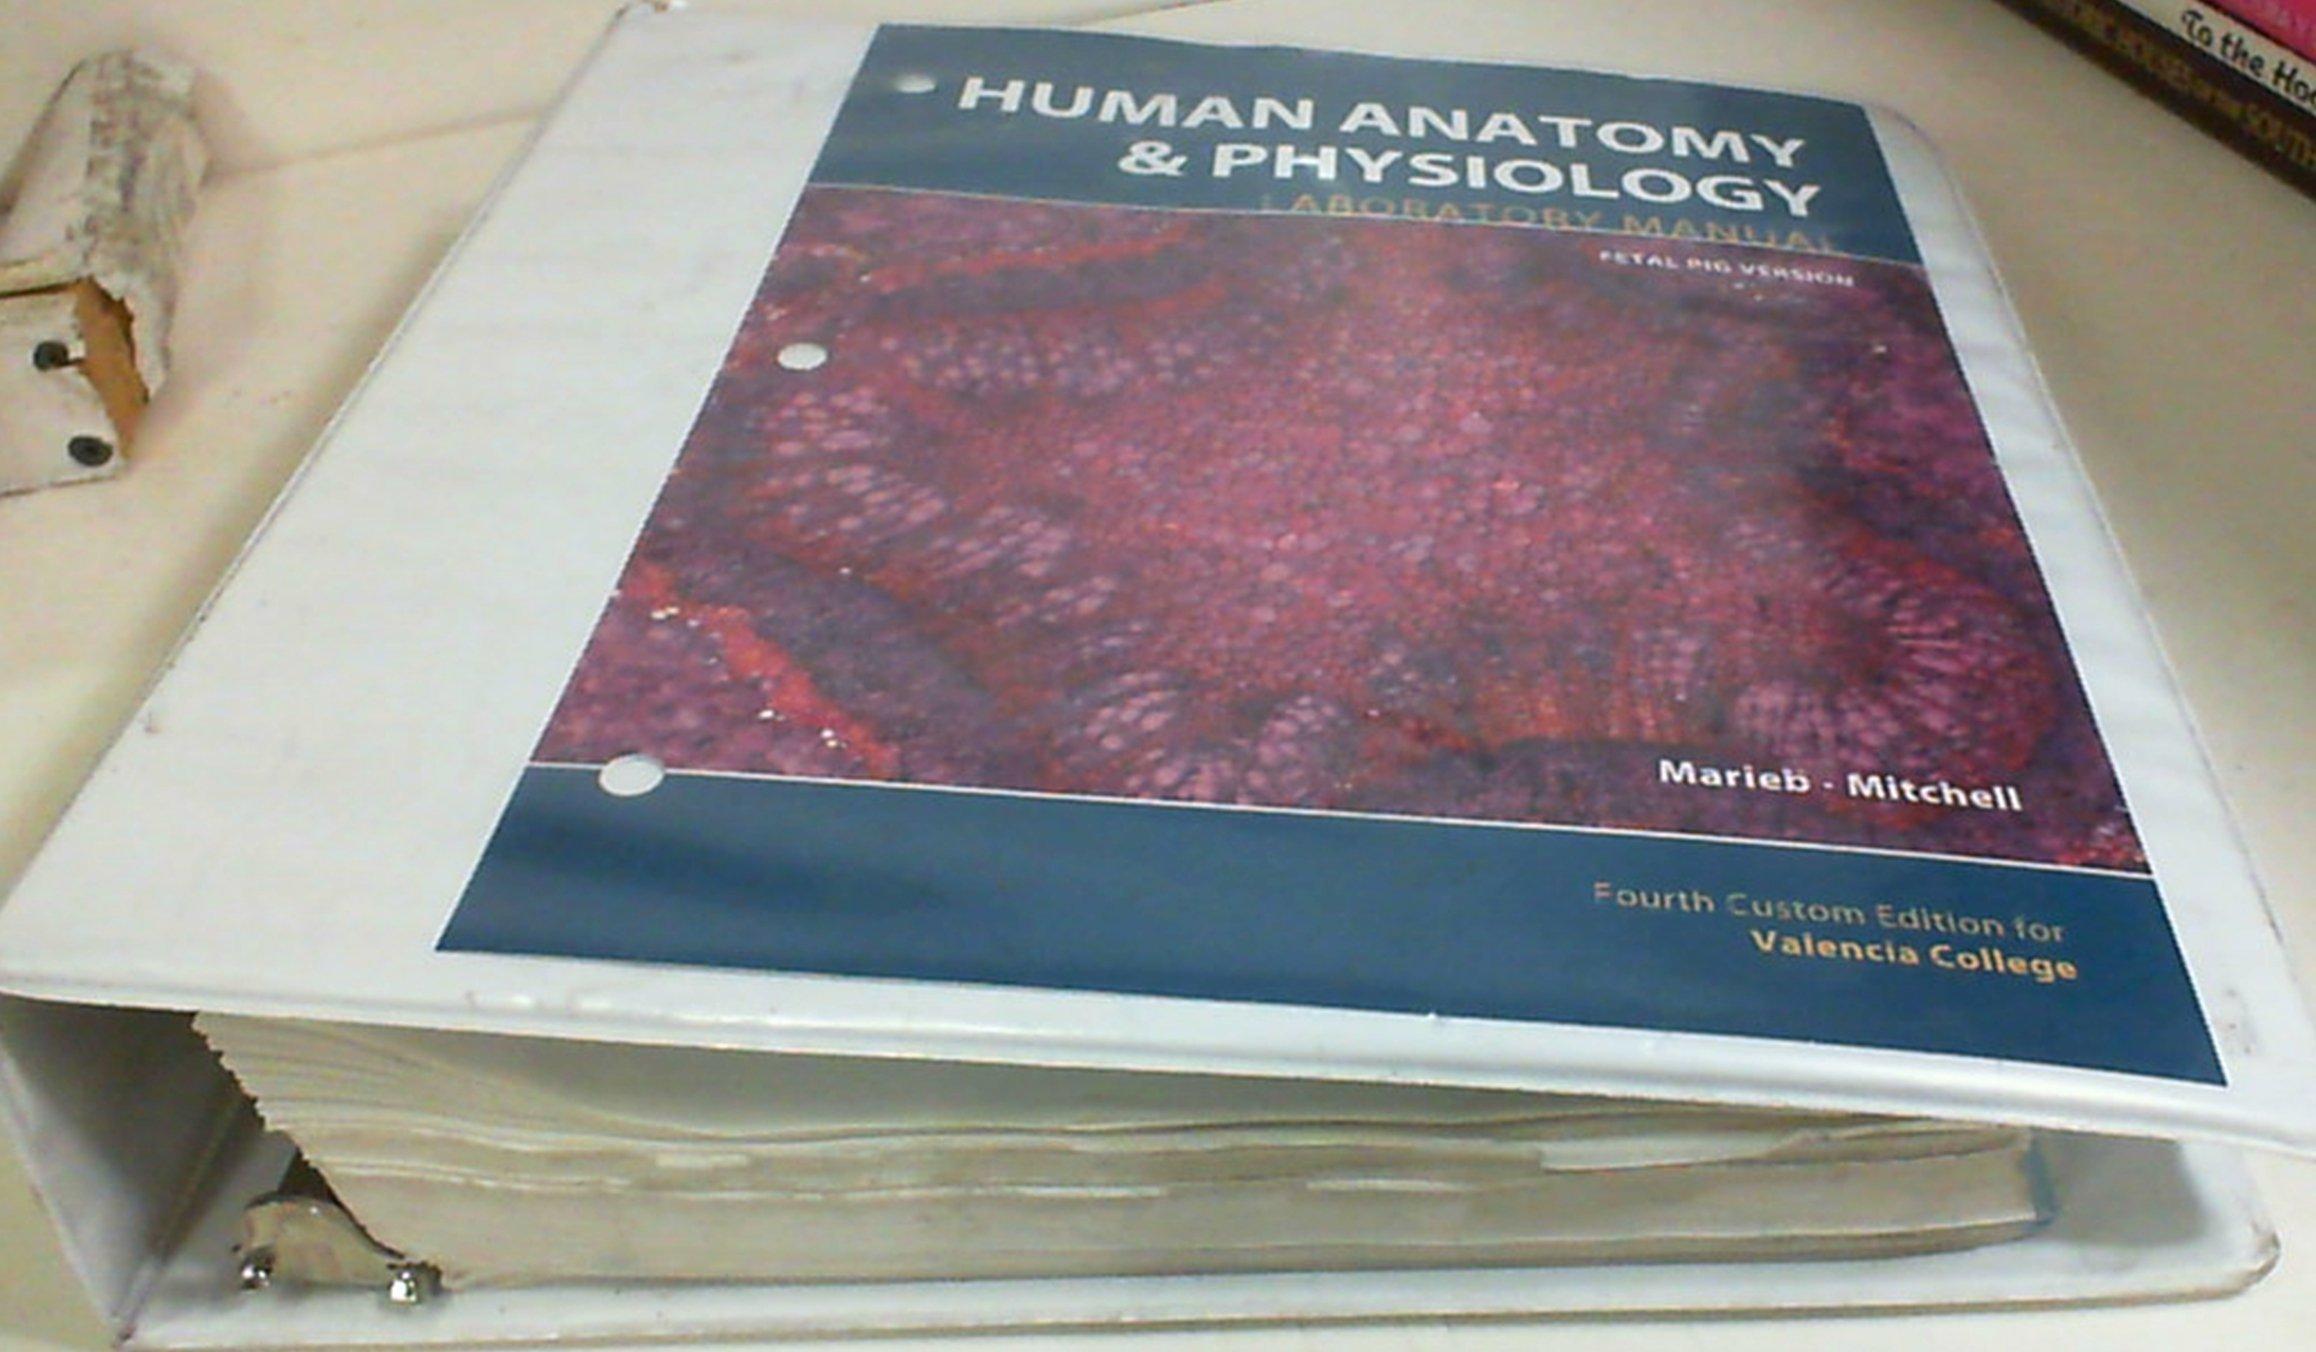 Human Anatomy & Physiology / Laboratory Manual / Fetal Pig Version ...